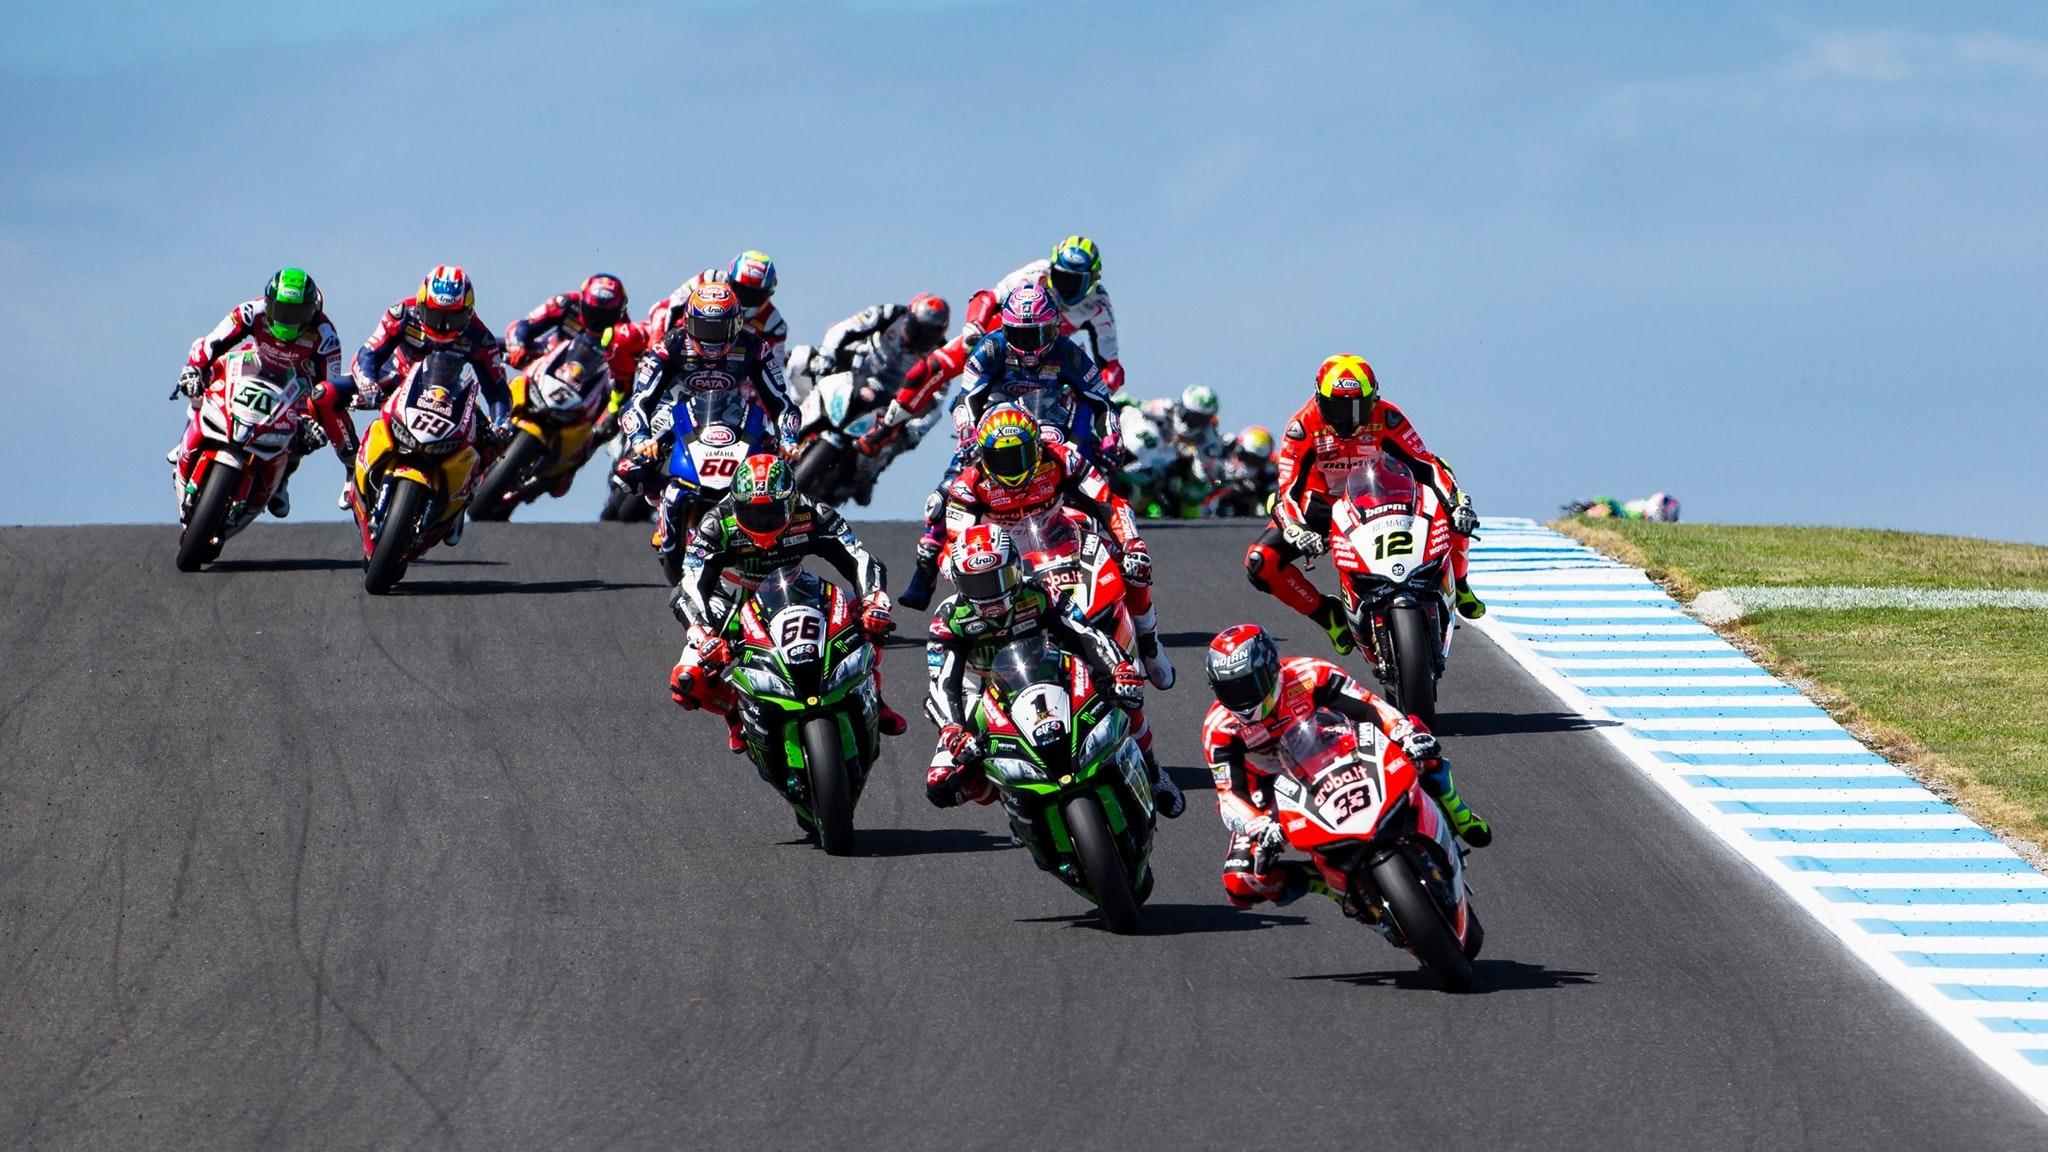 Superbike World Championship